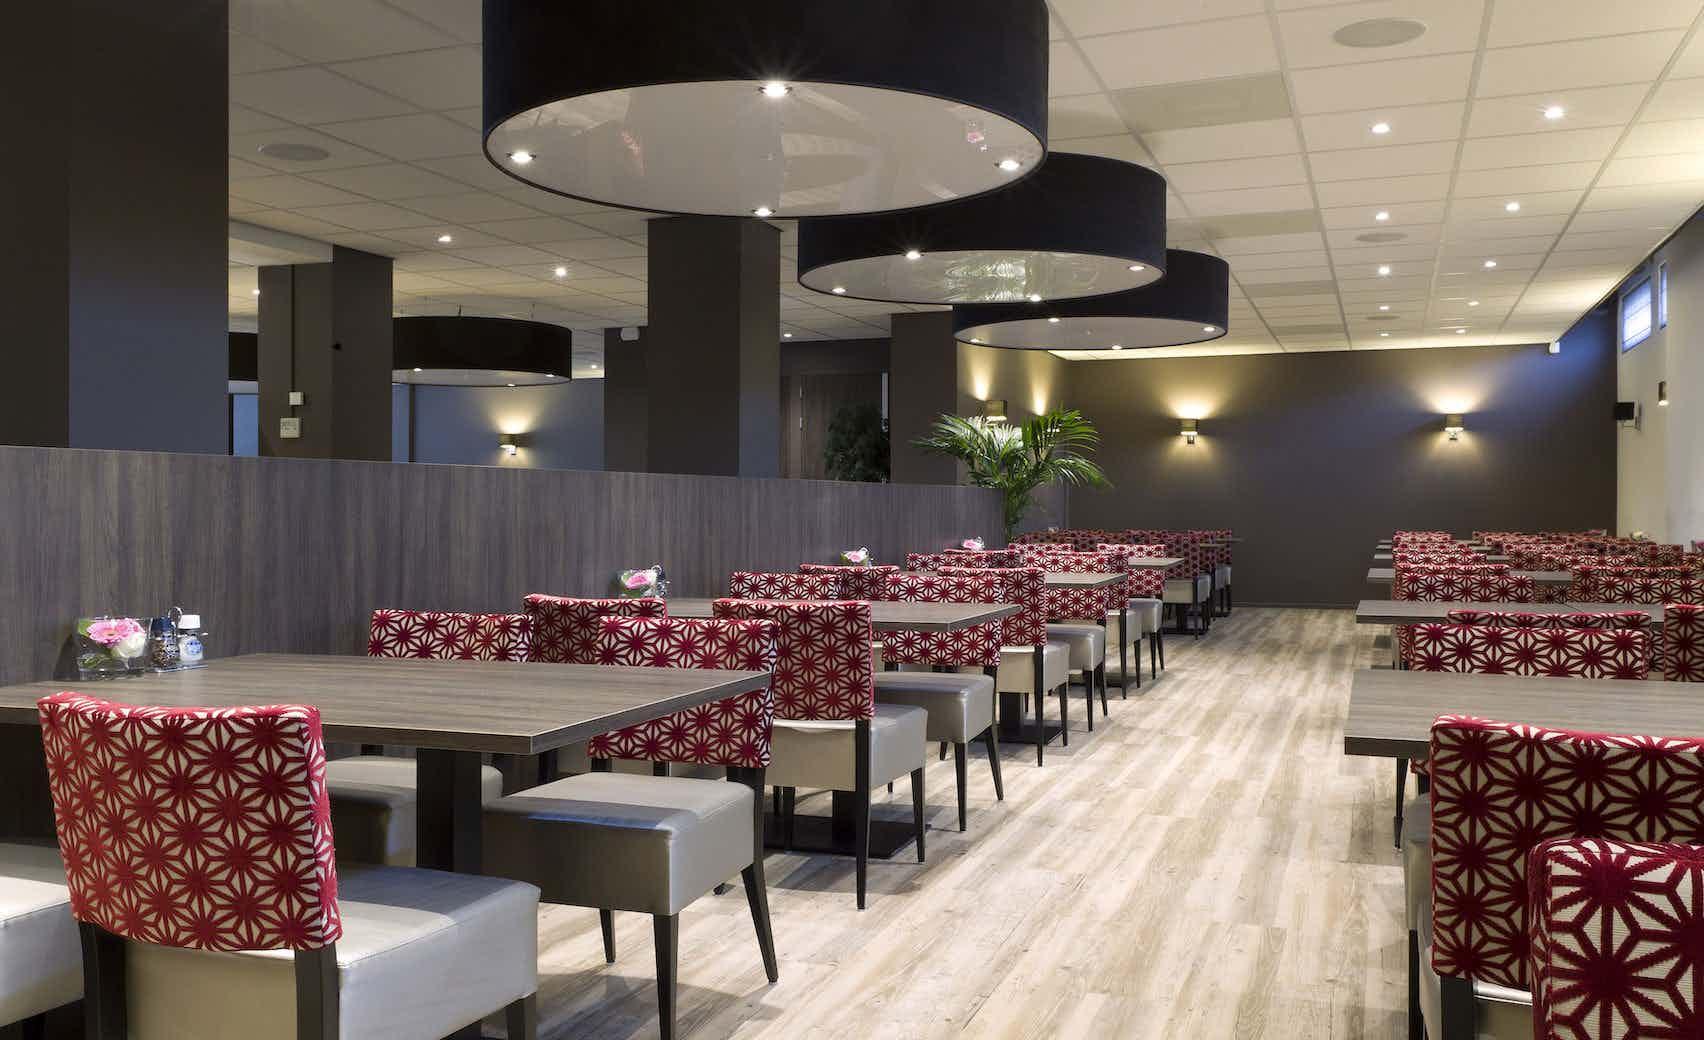 Restaurant, BCN Utrecht Cantraal Station